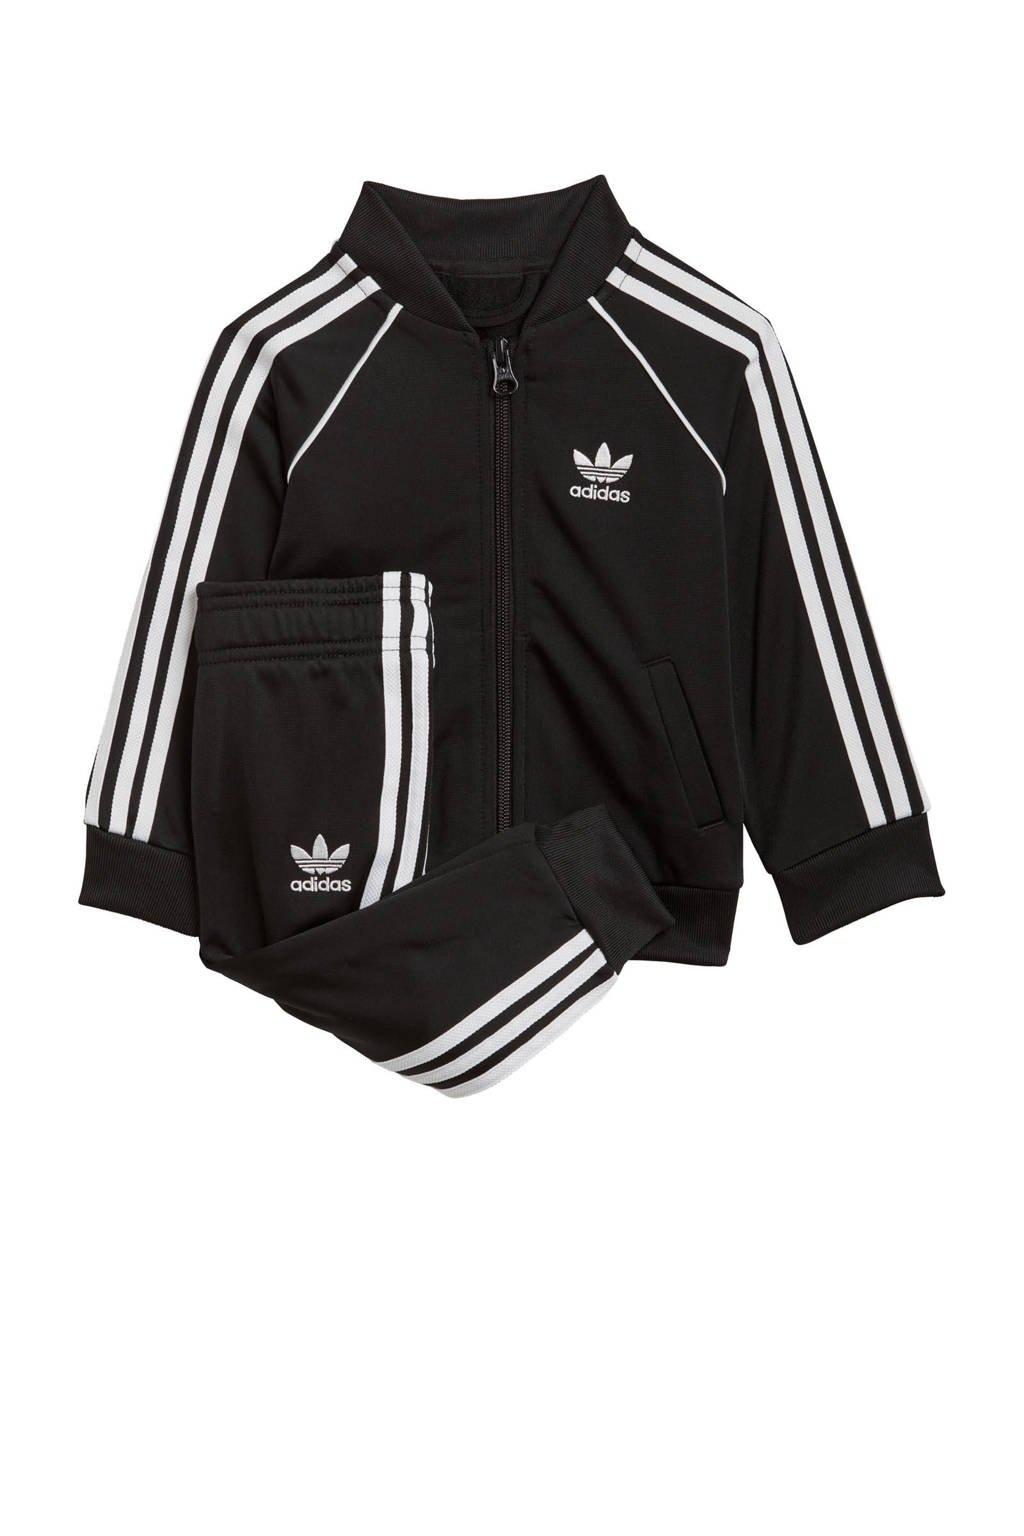 adidas Originals   Superstar Adicolor baby trainingspak zwart/wit, Zwart/wit